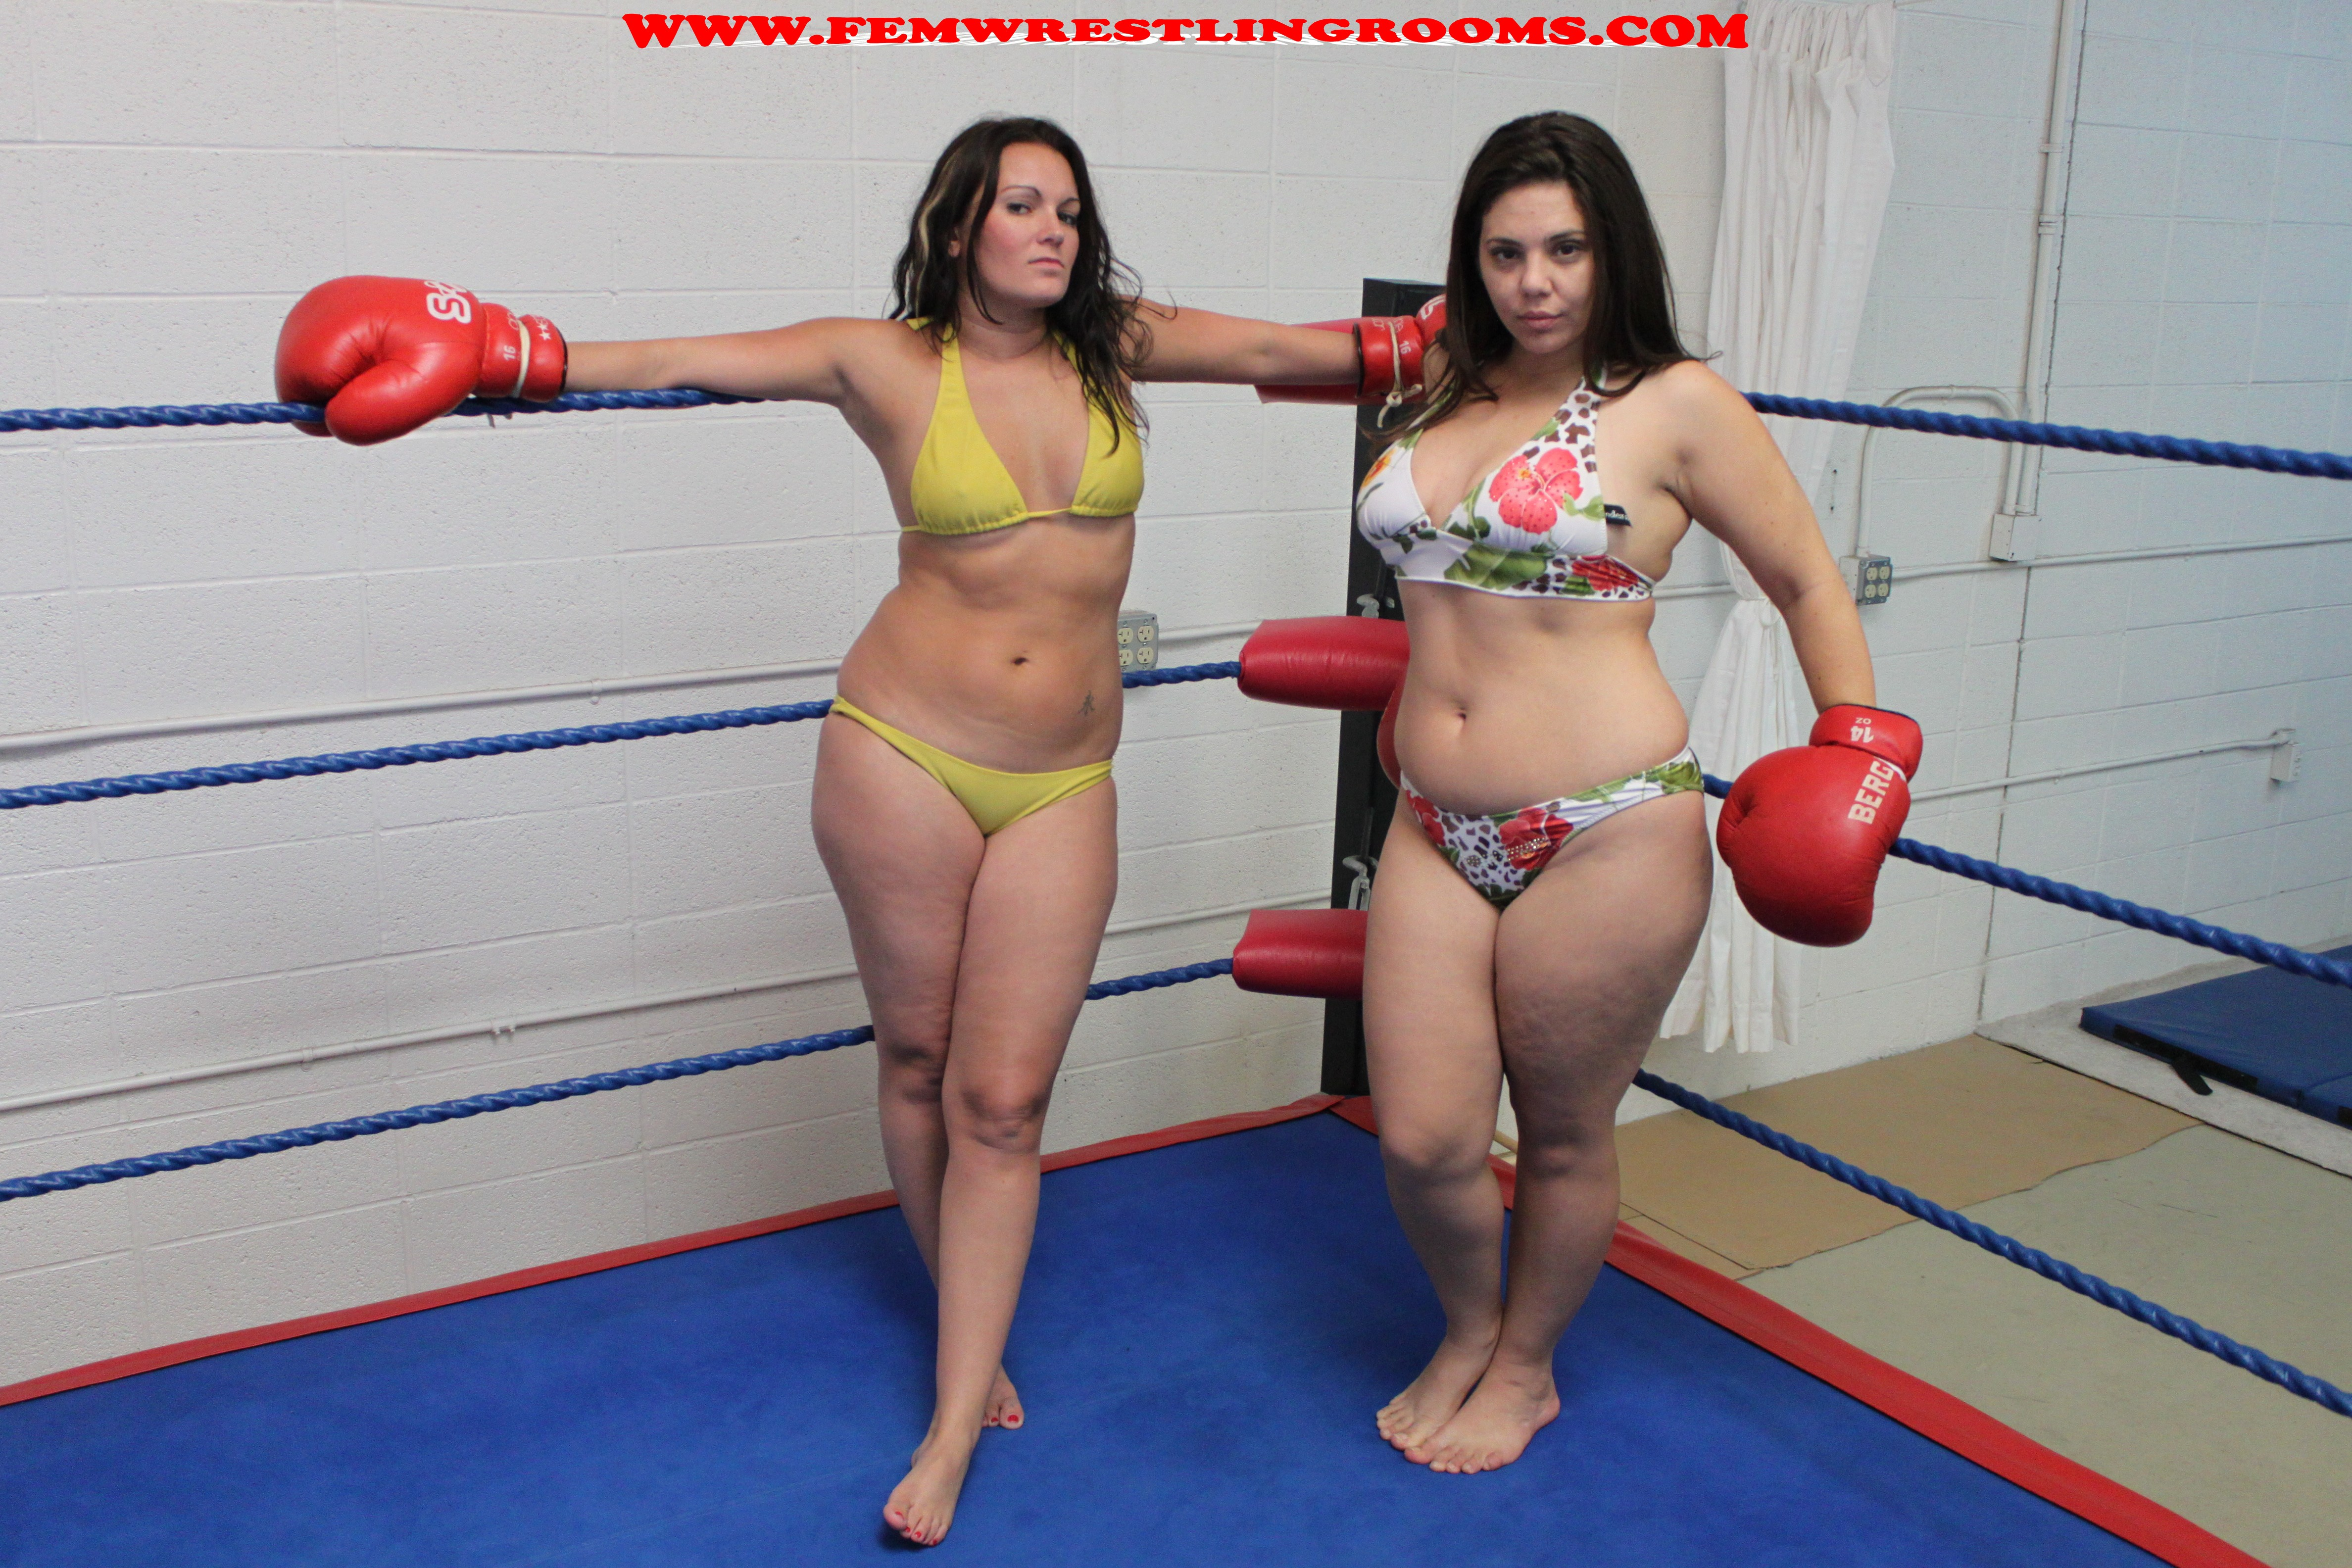 ... org female wrestling zone male vs female the mixed wrestling forum: crazygallery.info/mutiny-mixed-wrestling.html